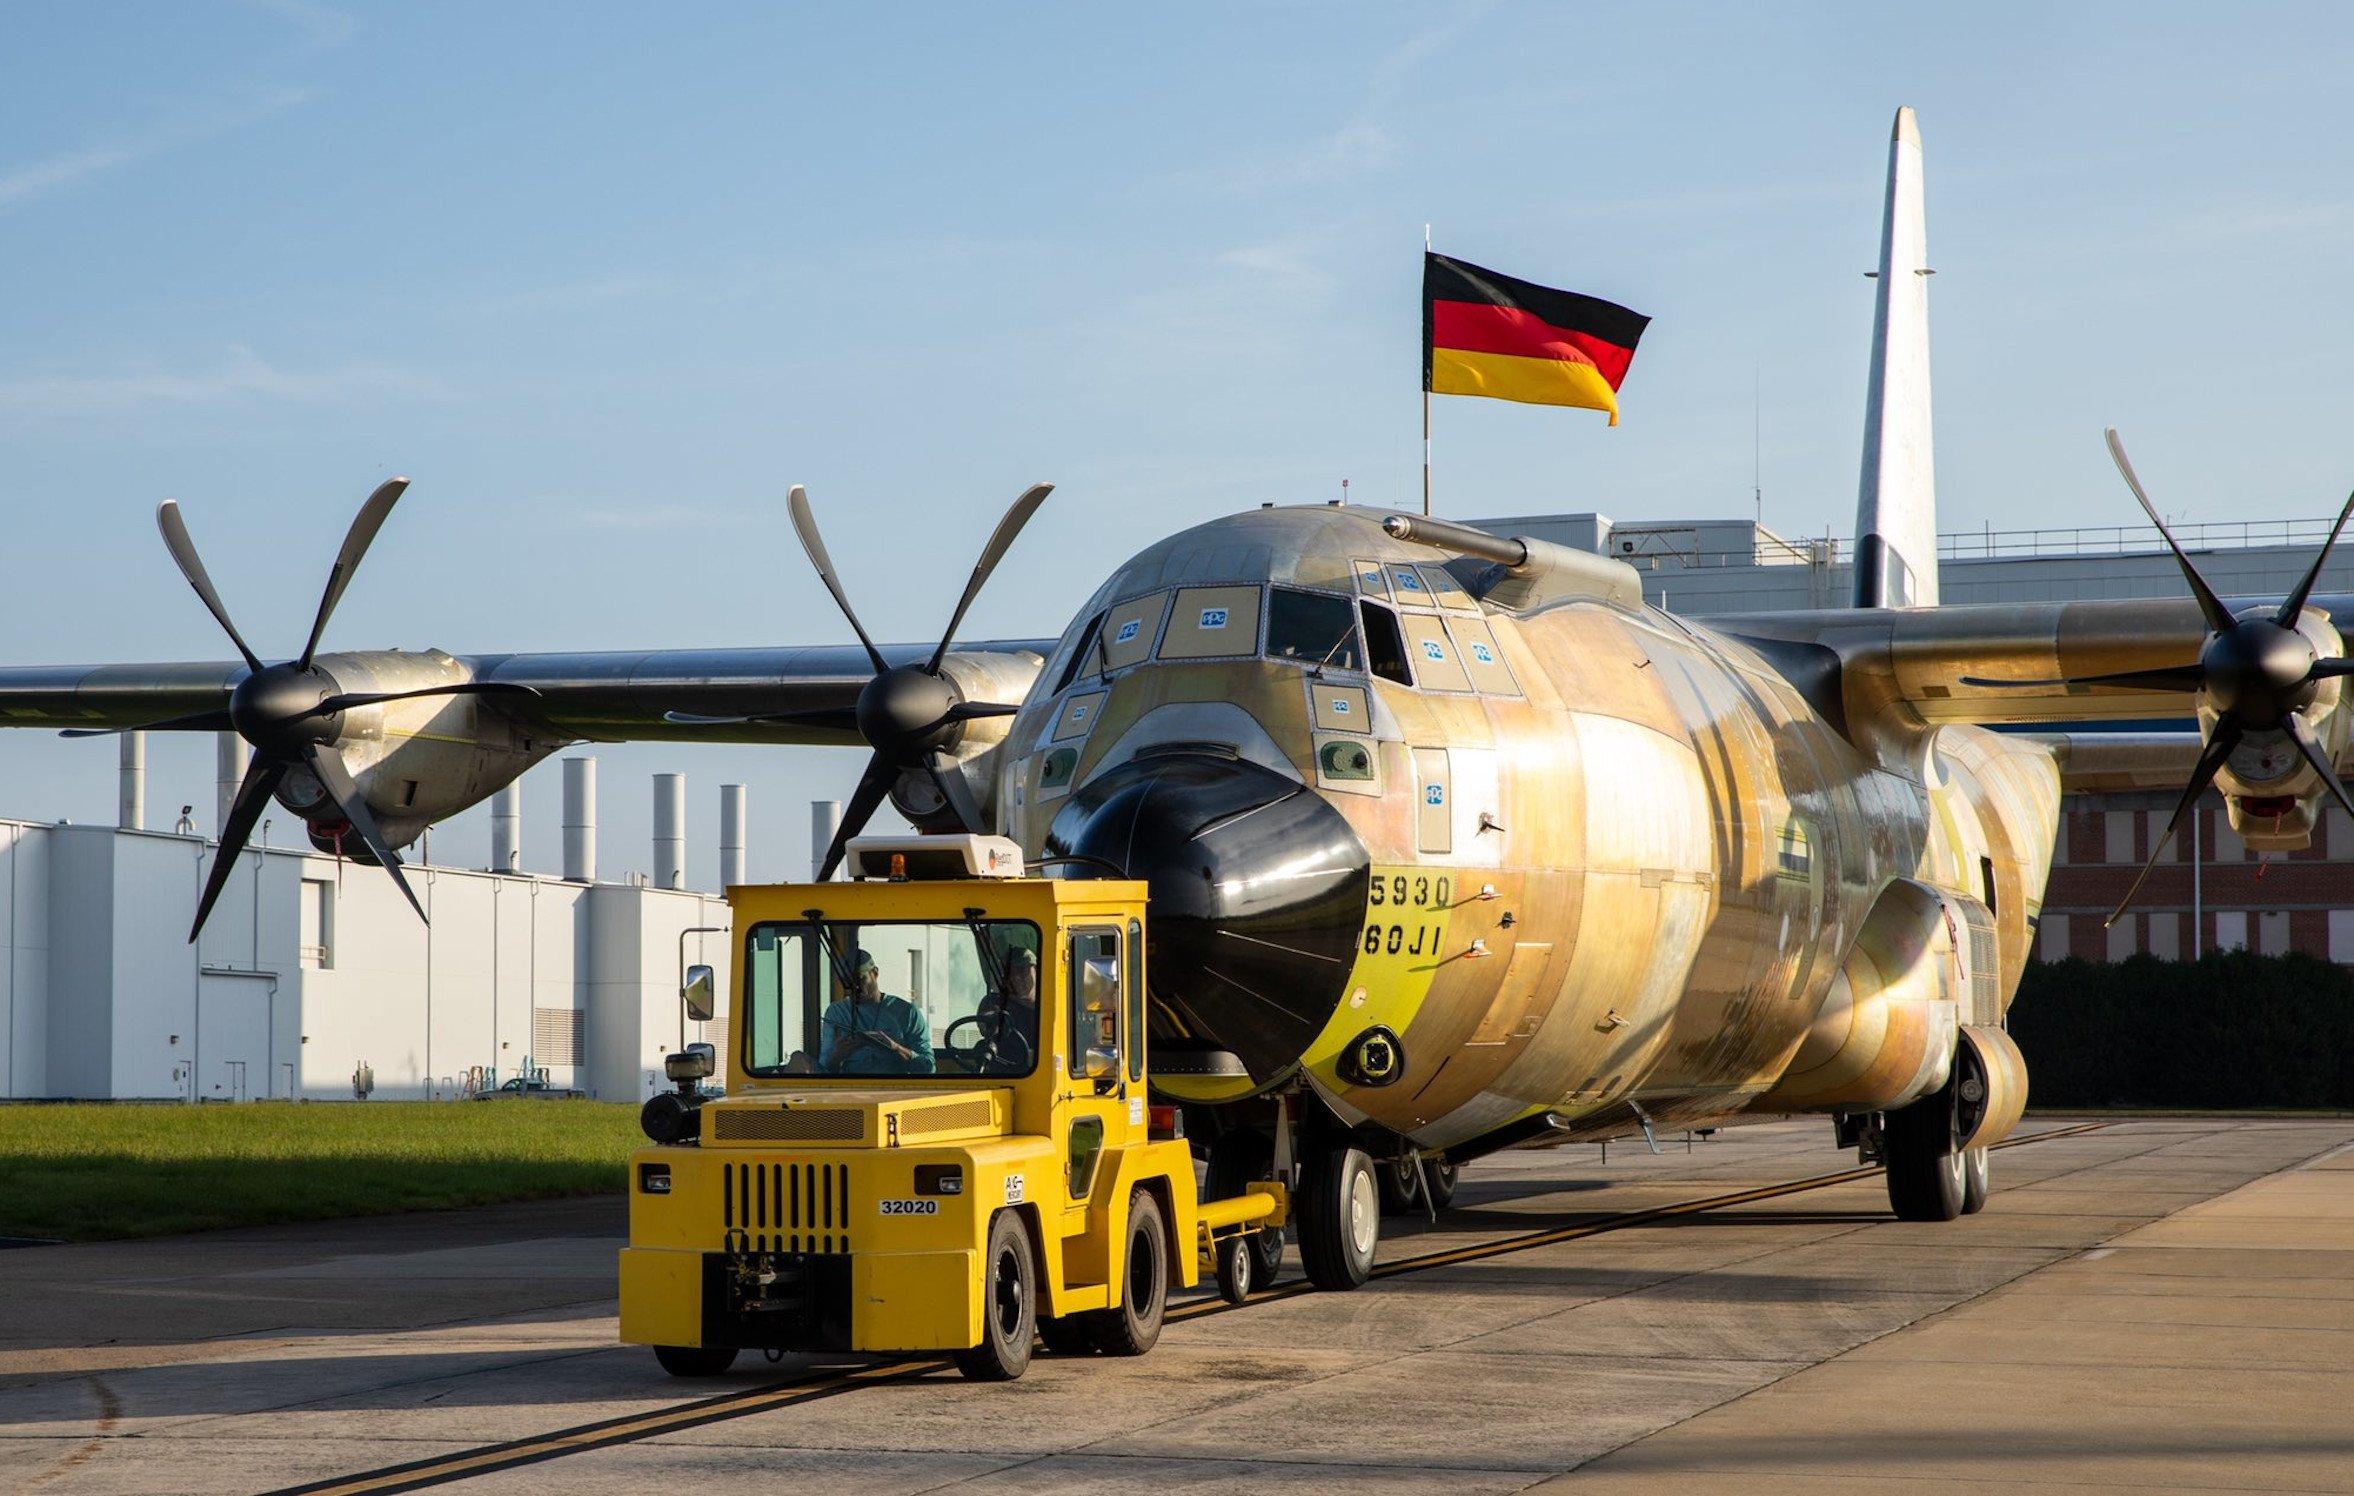 First German C-130J-30 rolls off production line 22-7-21 [Luftwaffe]